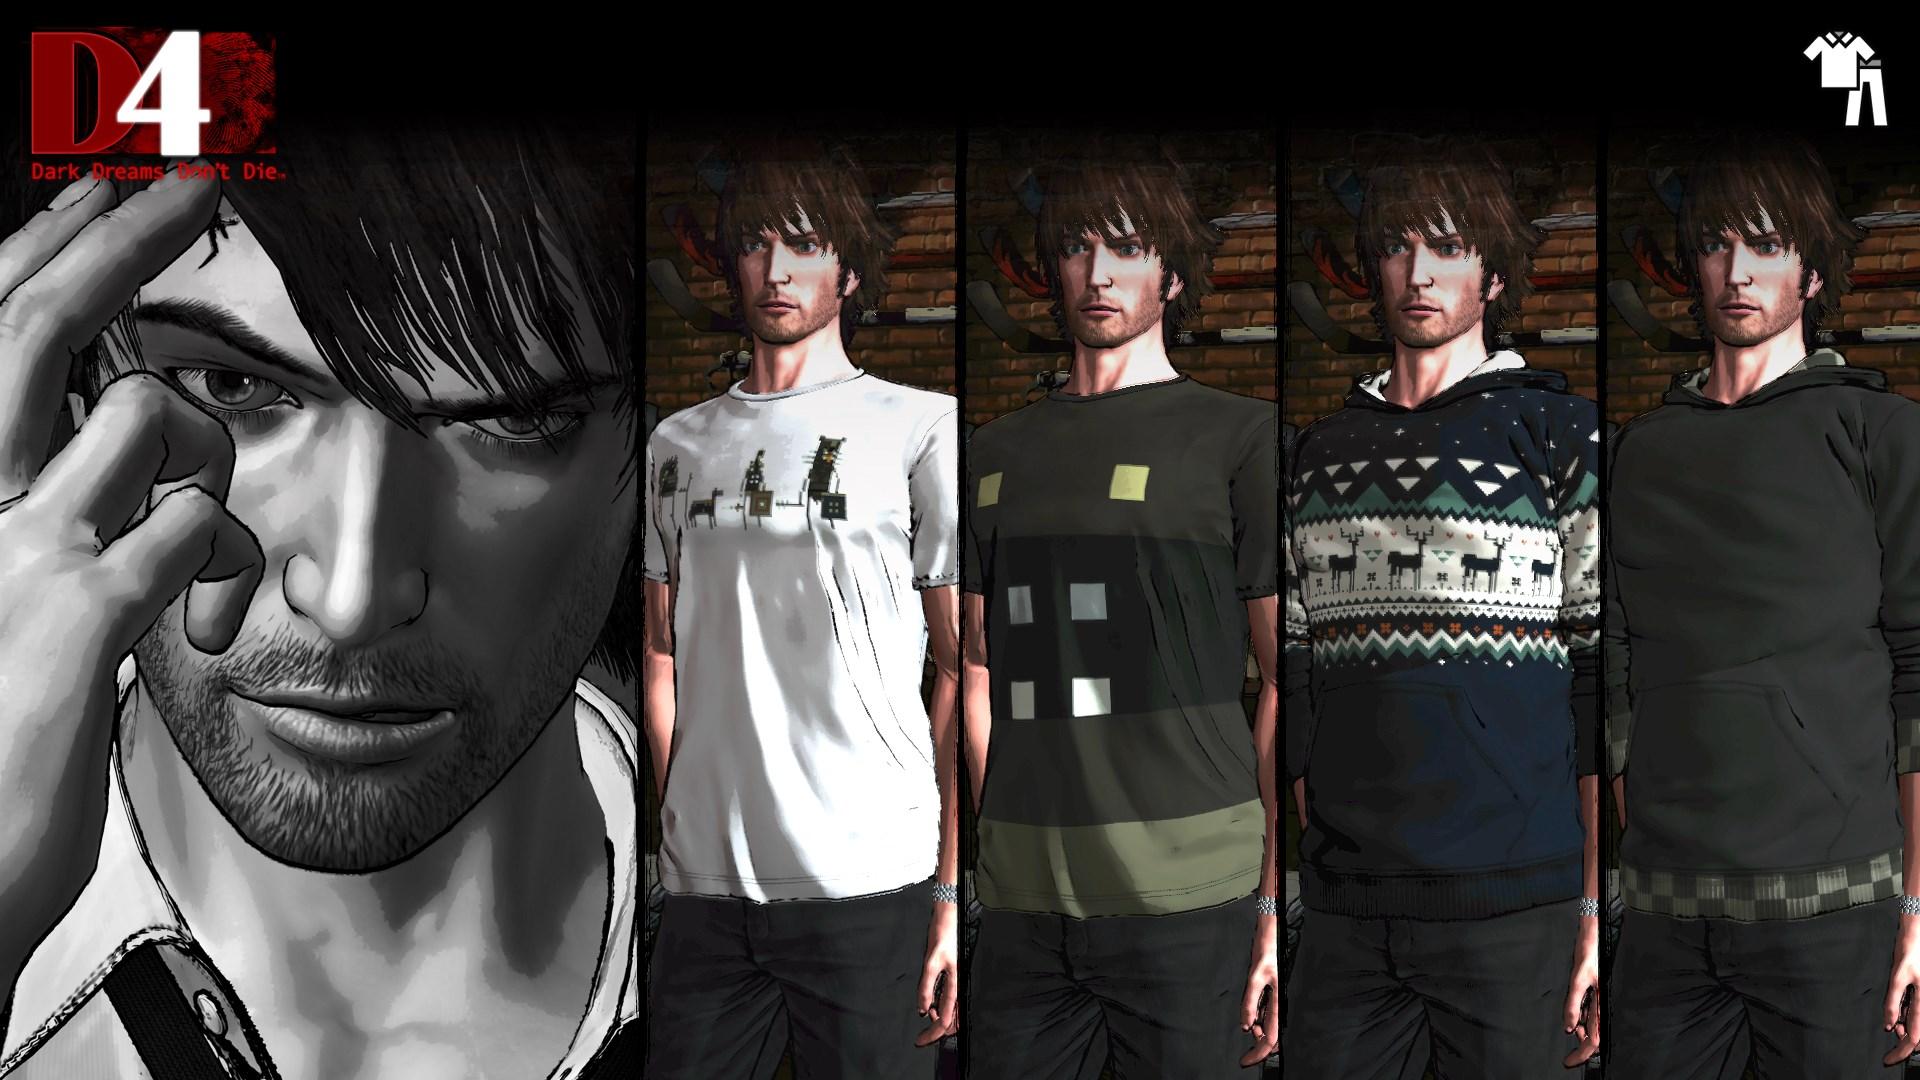 D4: Dark Dreams Don't Die - Superbrothers:Sword & Sworcery EP Clothing Set